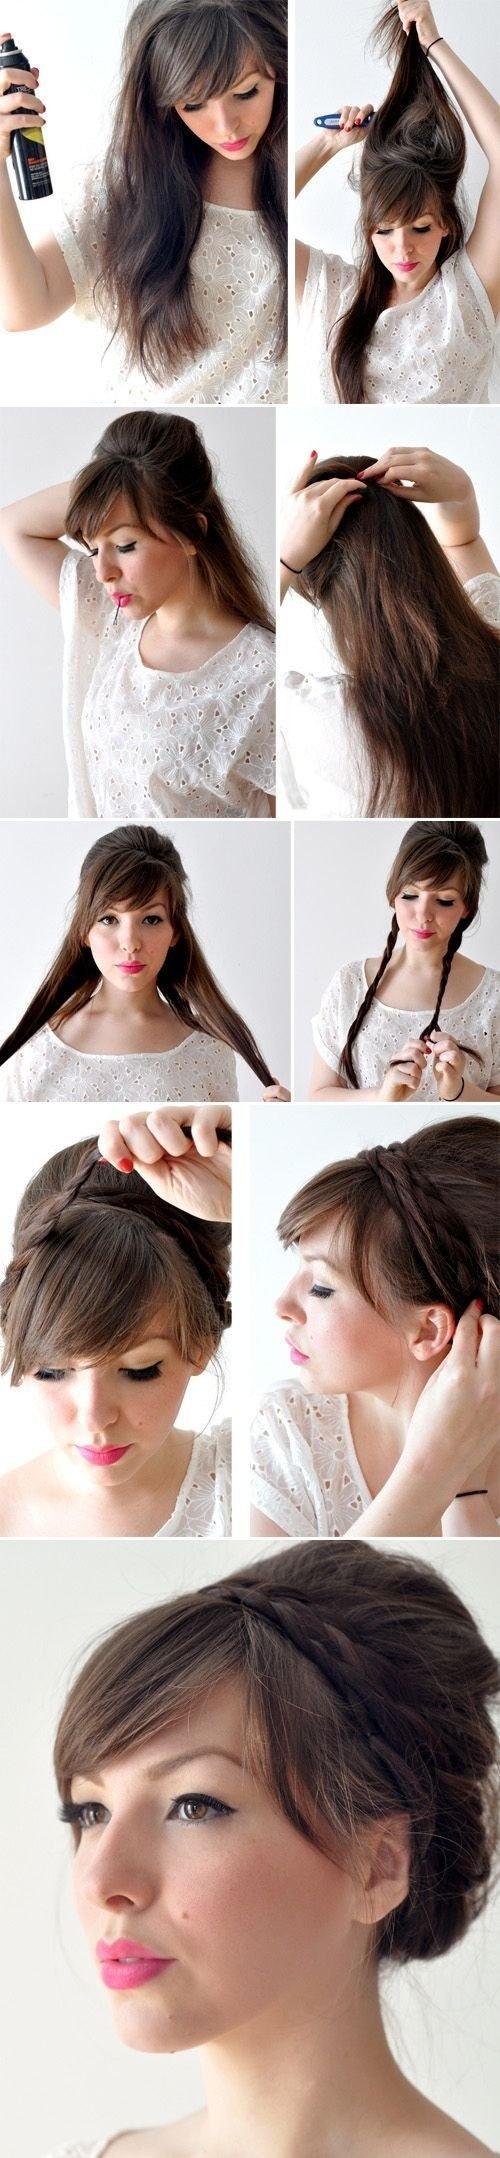 "Check out Nattha Pinsuwan's ""Cosmetology : Simple updo!"" Decalz @Lockerz http://lockerz.com/d/20299447?ref=diana.latorre.50"